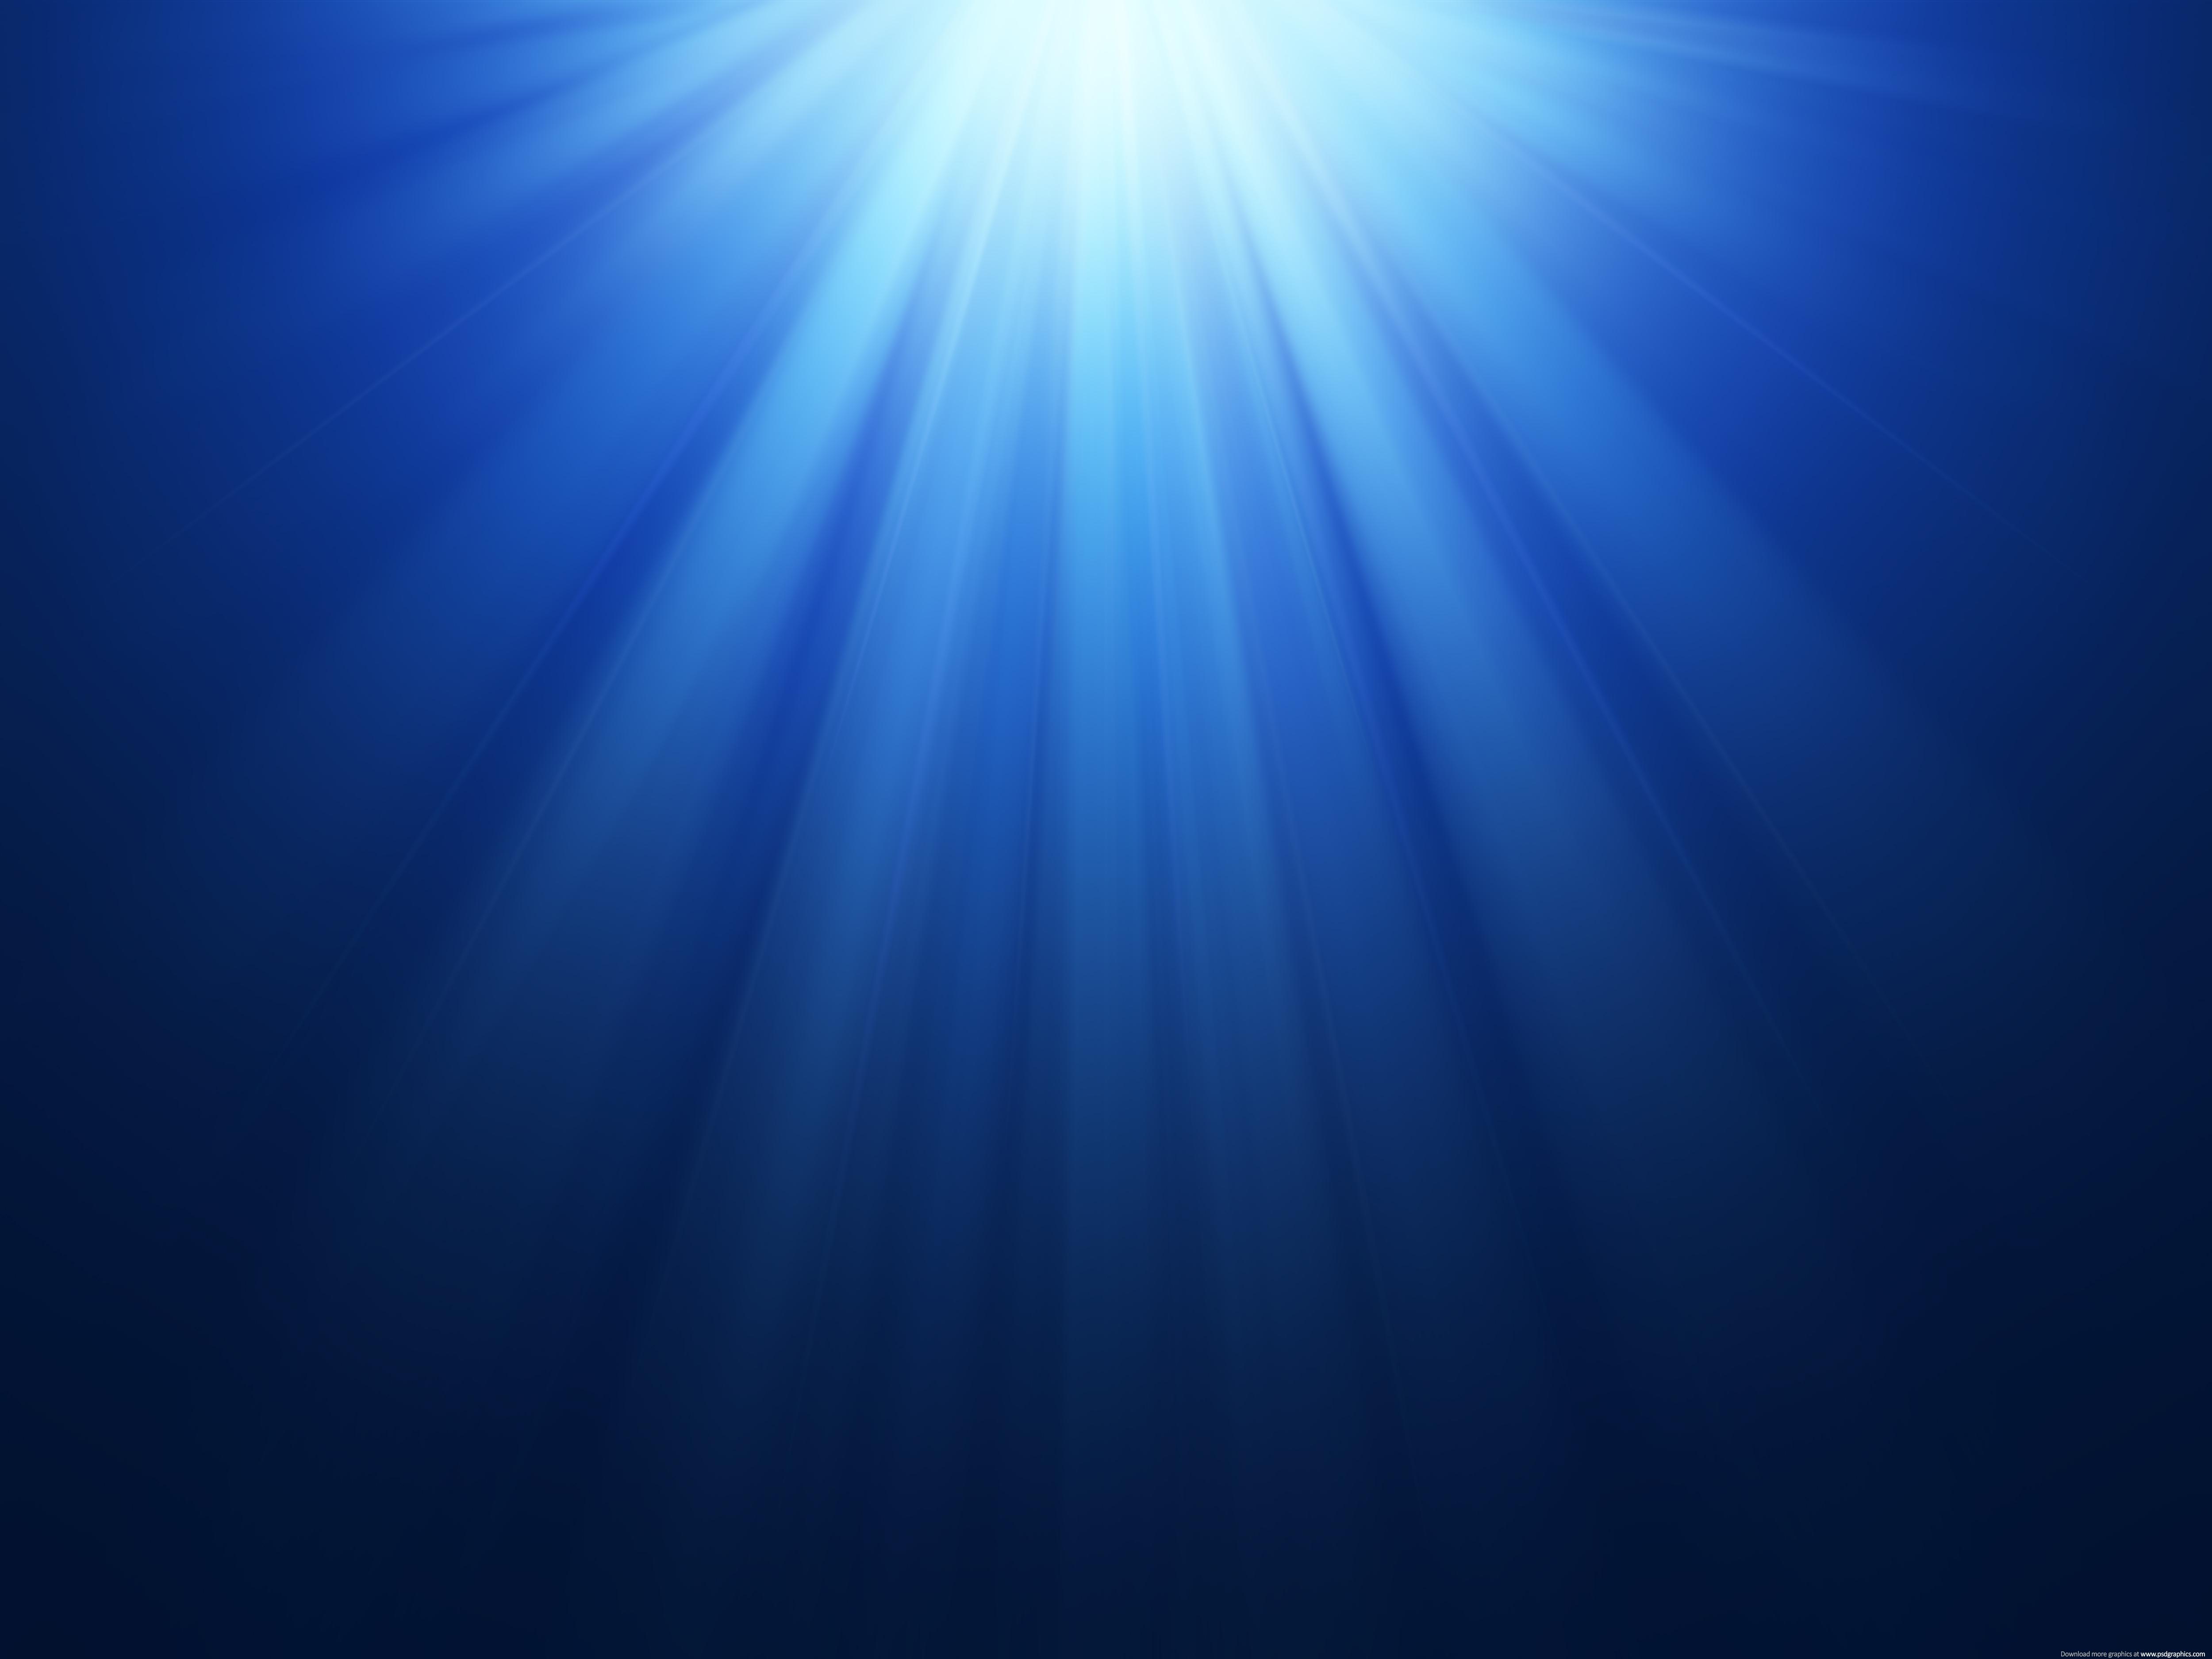 Beautiful blue rays background PSDGraphics 5000x3750